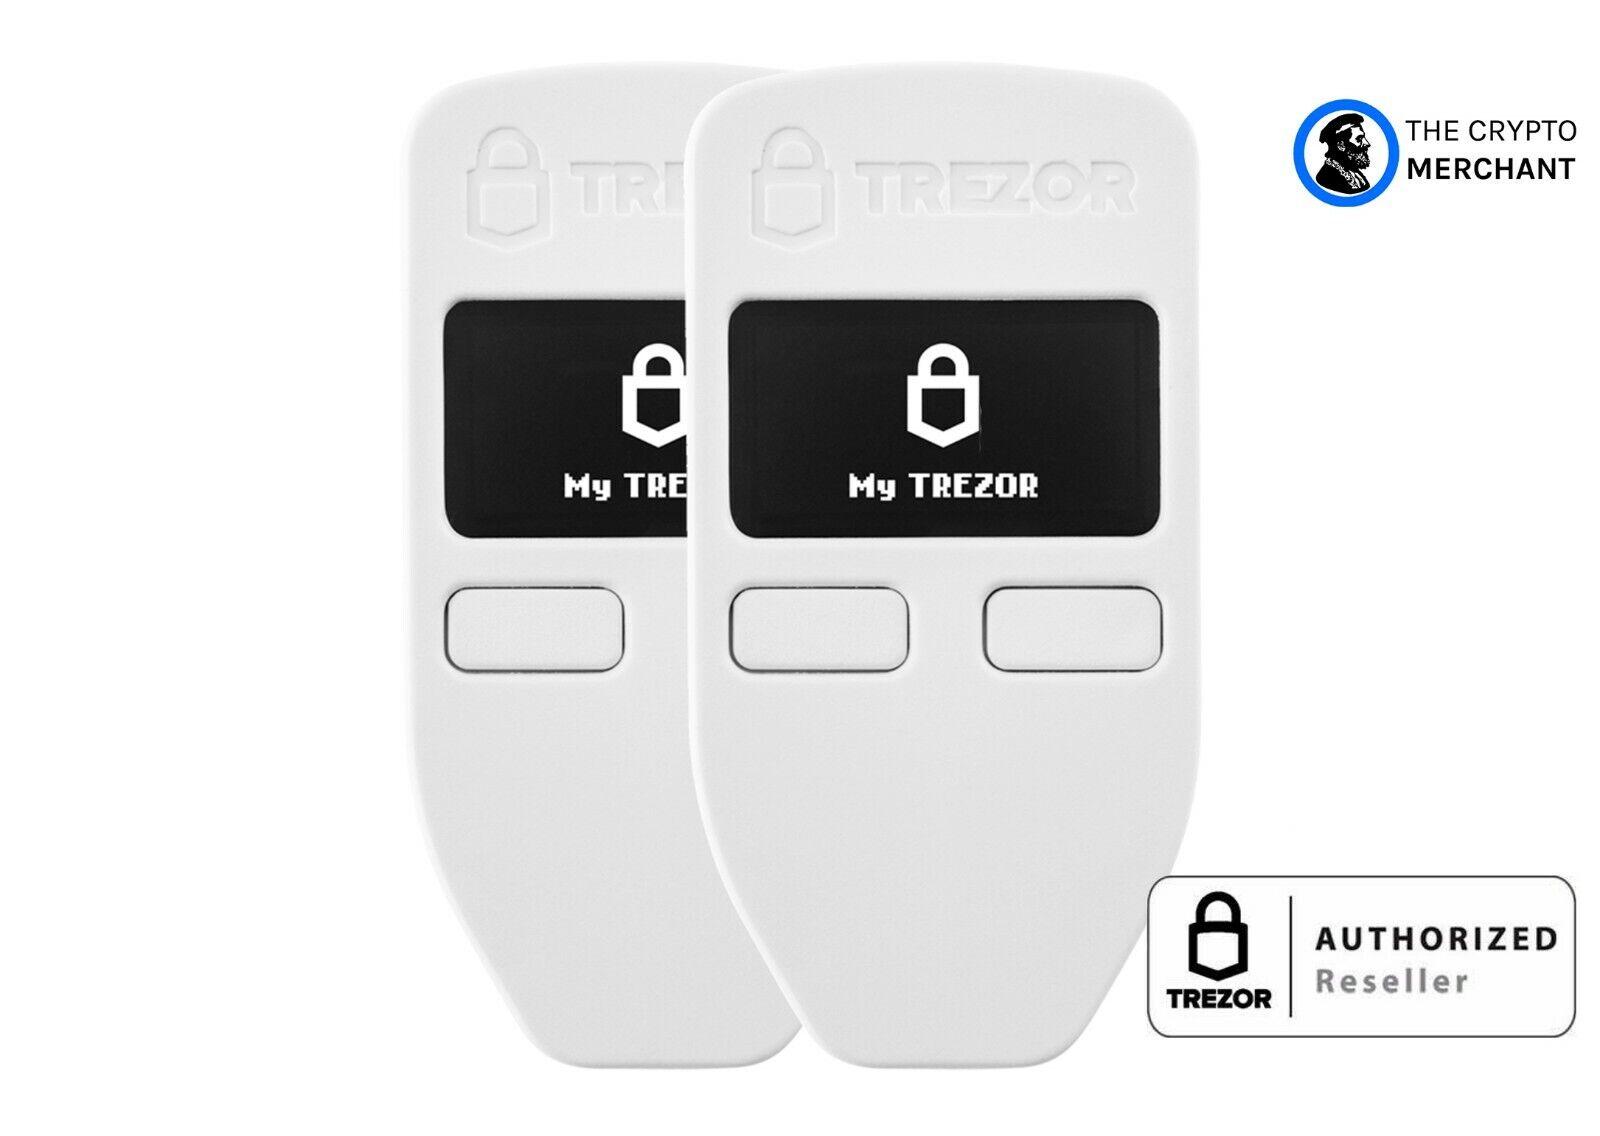 Ledger Nano X and Trezor Model T Hardware Wallet Backup Pack AUTHORIZED RETAILER